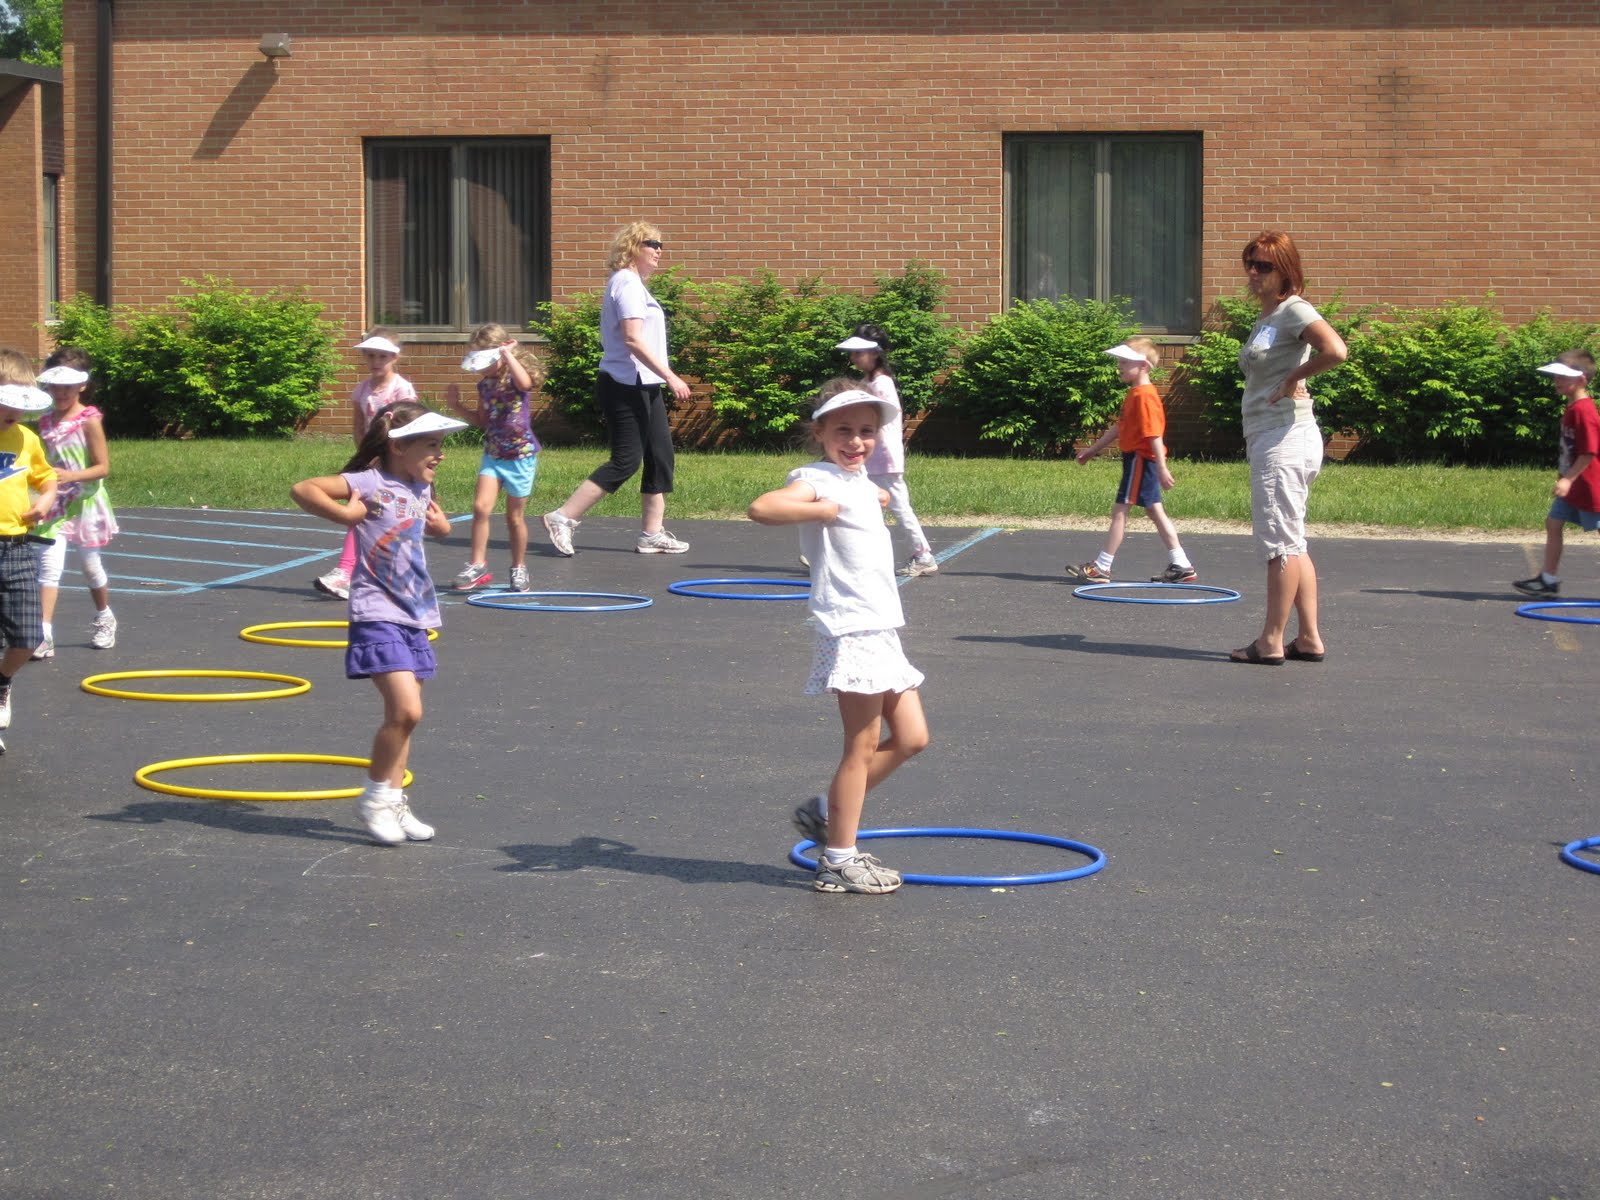 KatieMeganJessica Walkathon and Kinder Kids Olympics